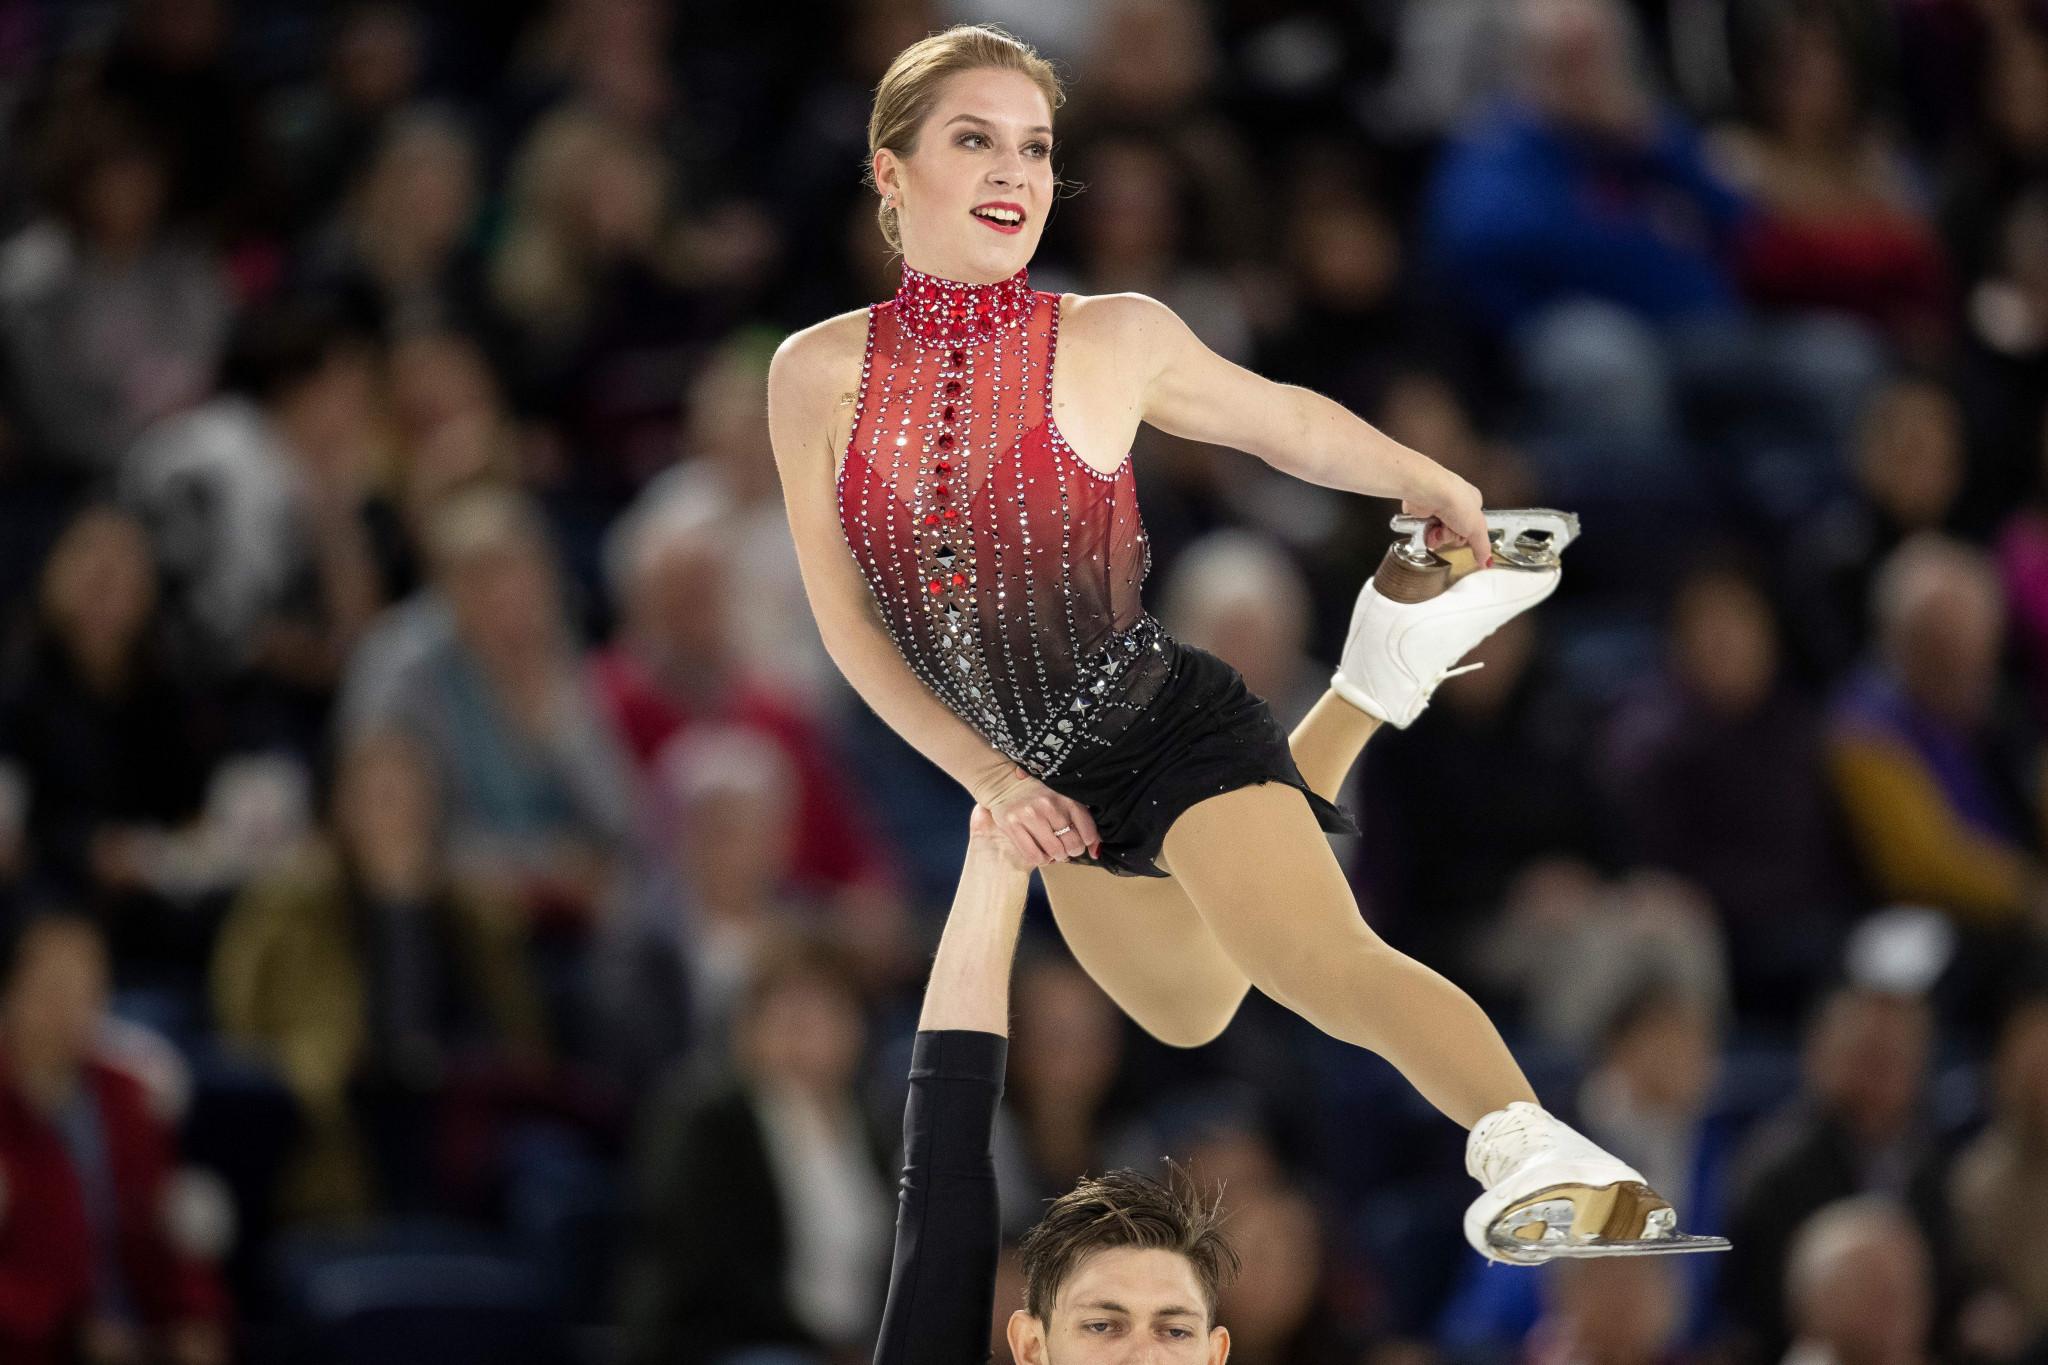 Australian figure skater Ekaterina Alexandrovskaya died aged 20 in June ©Getty Images